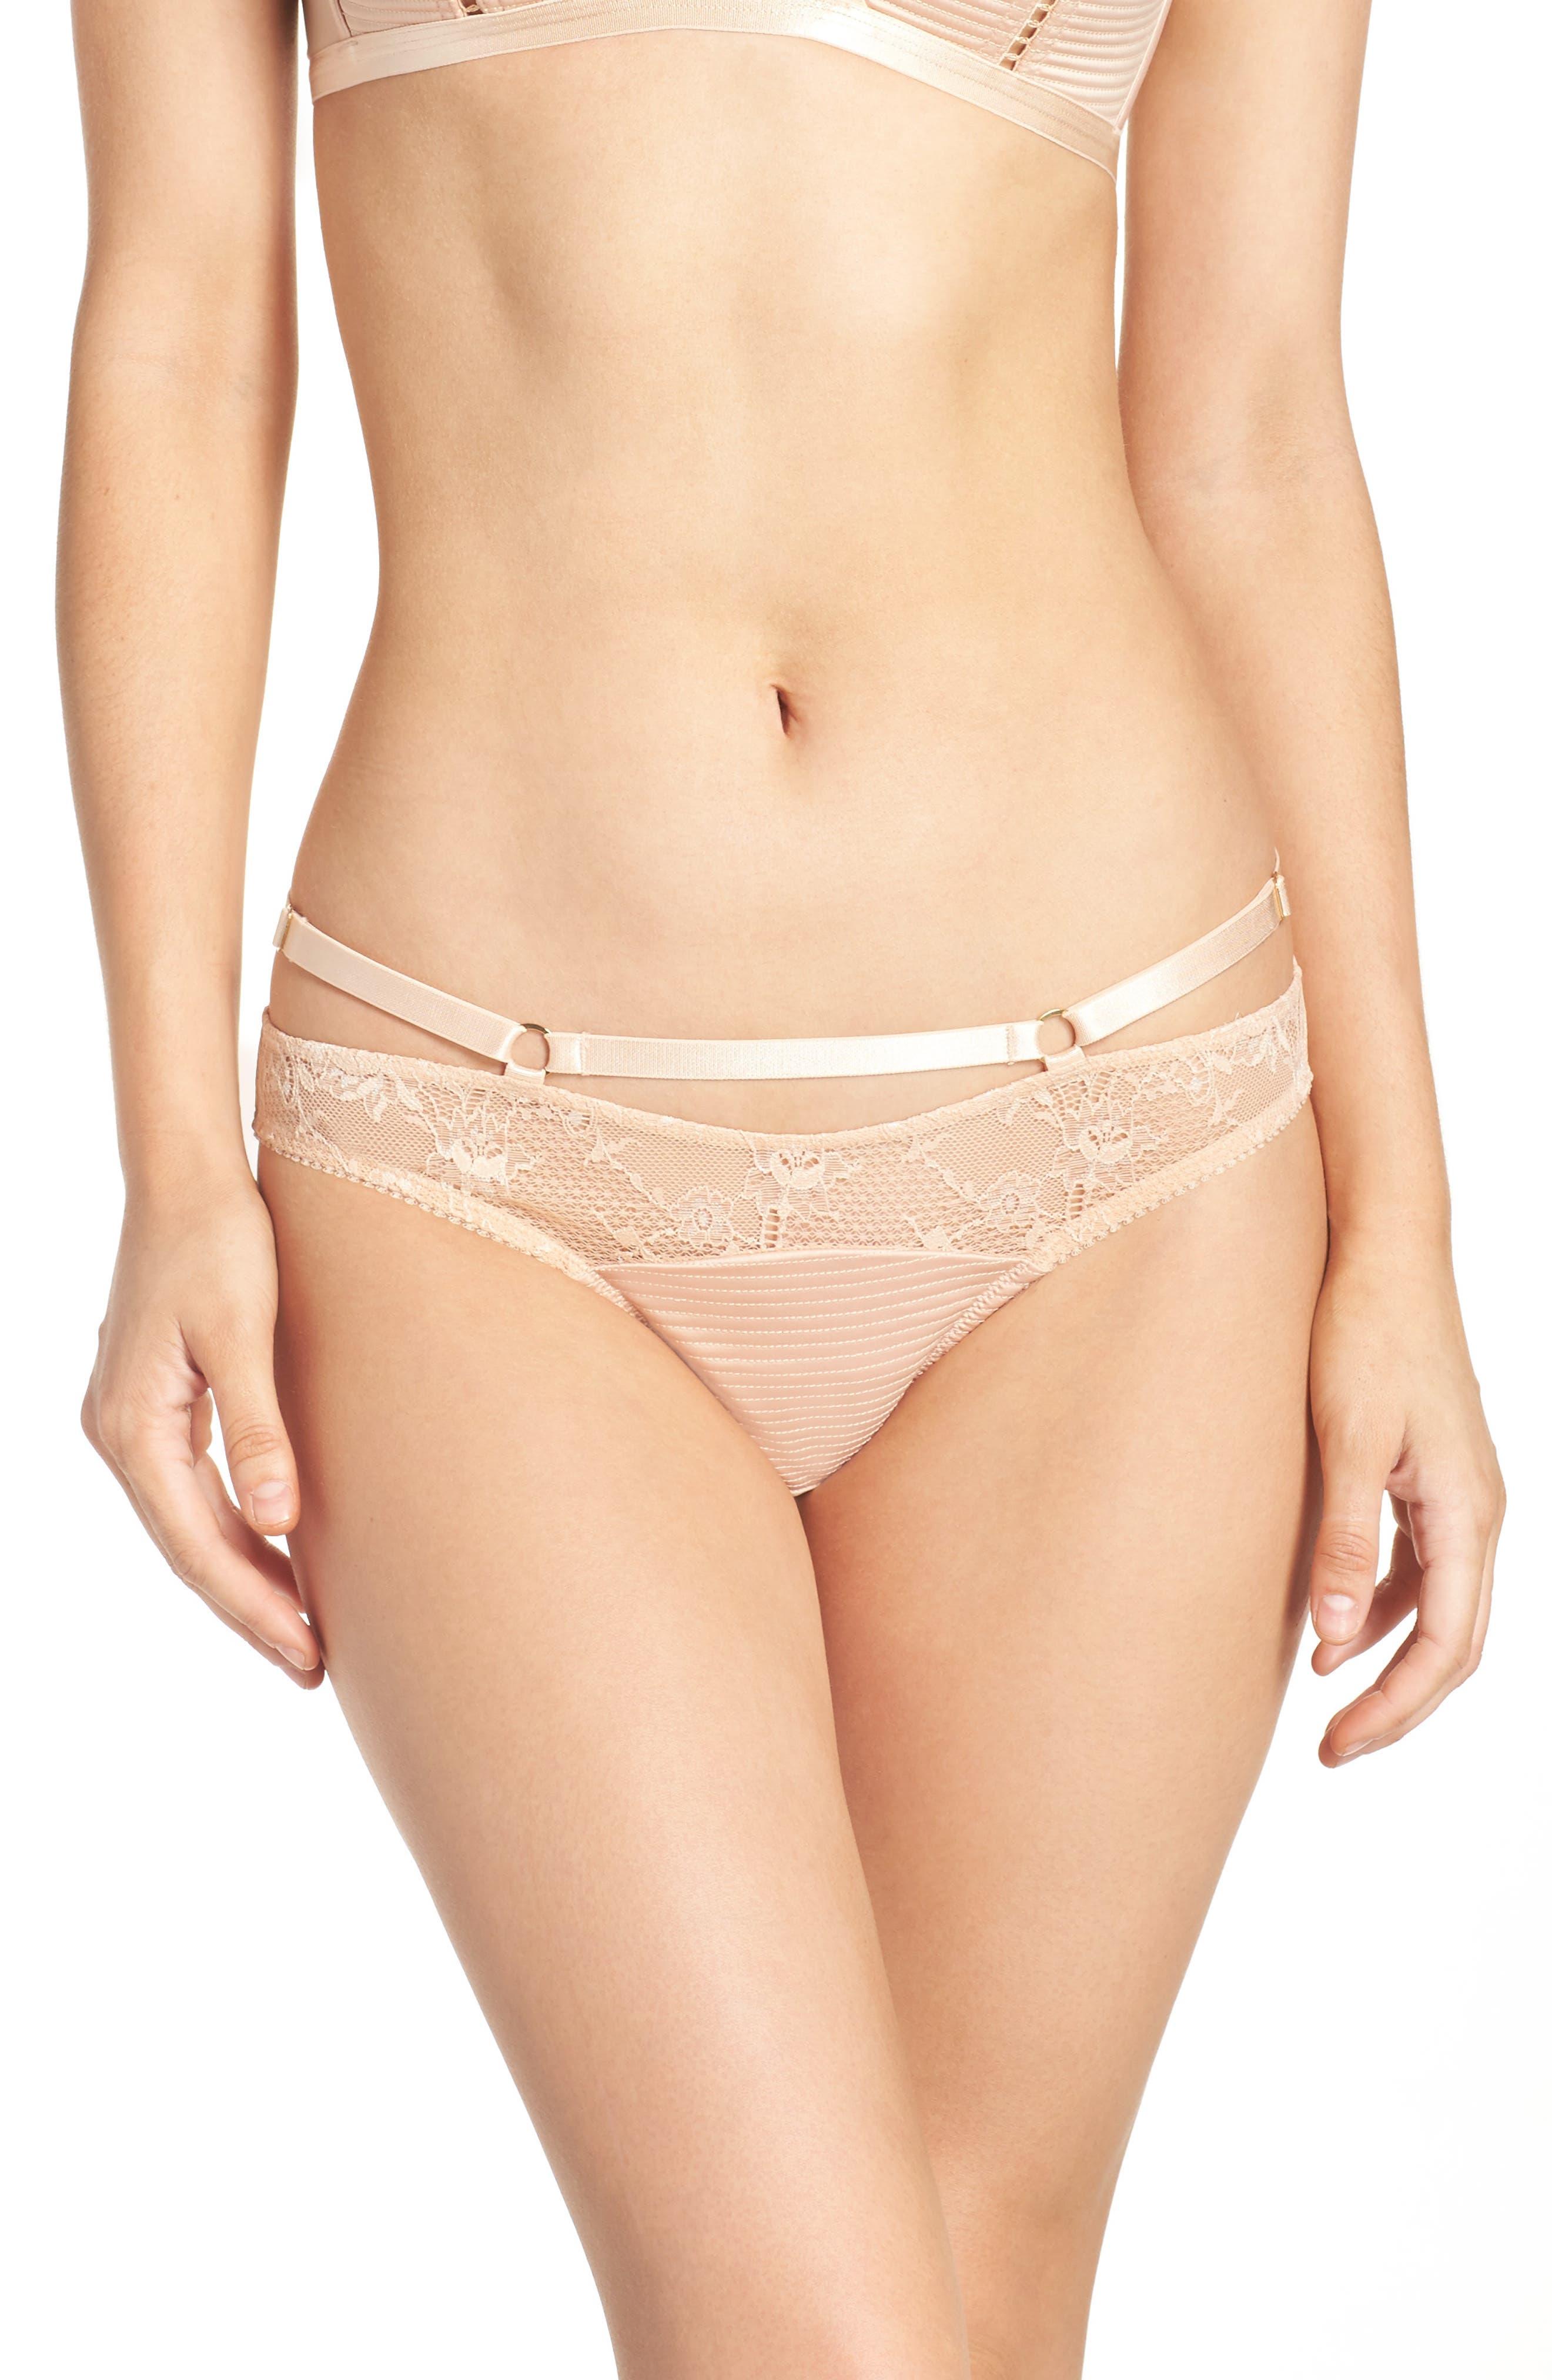 Lace Bikini,                         Main,                         color, Creme Caramel